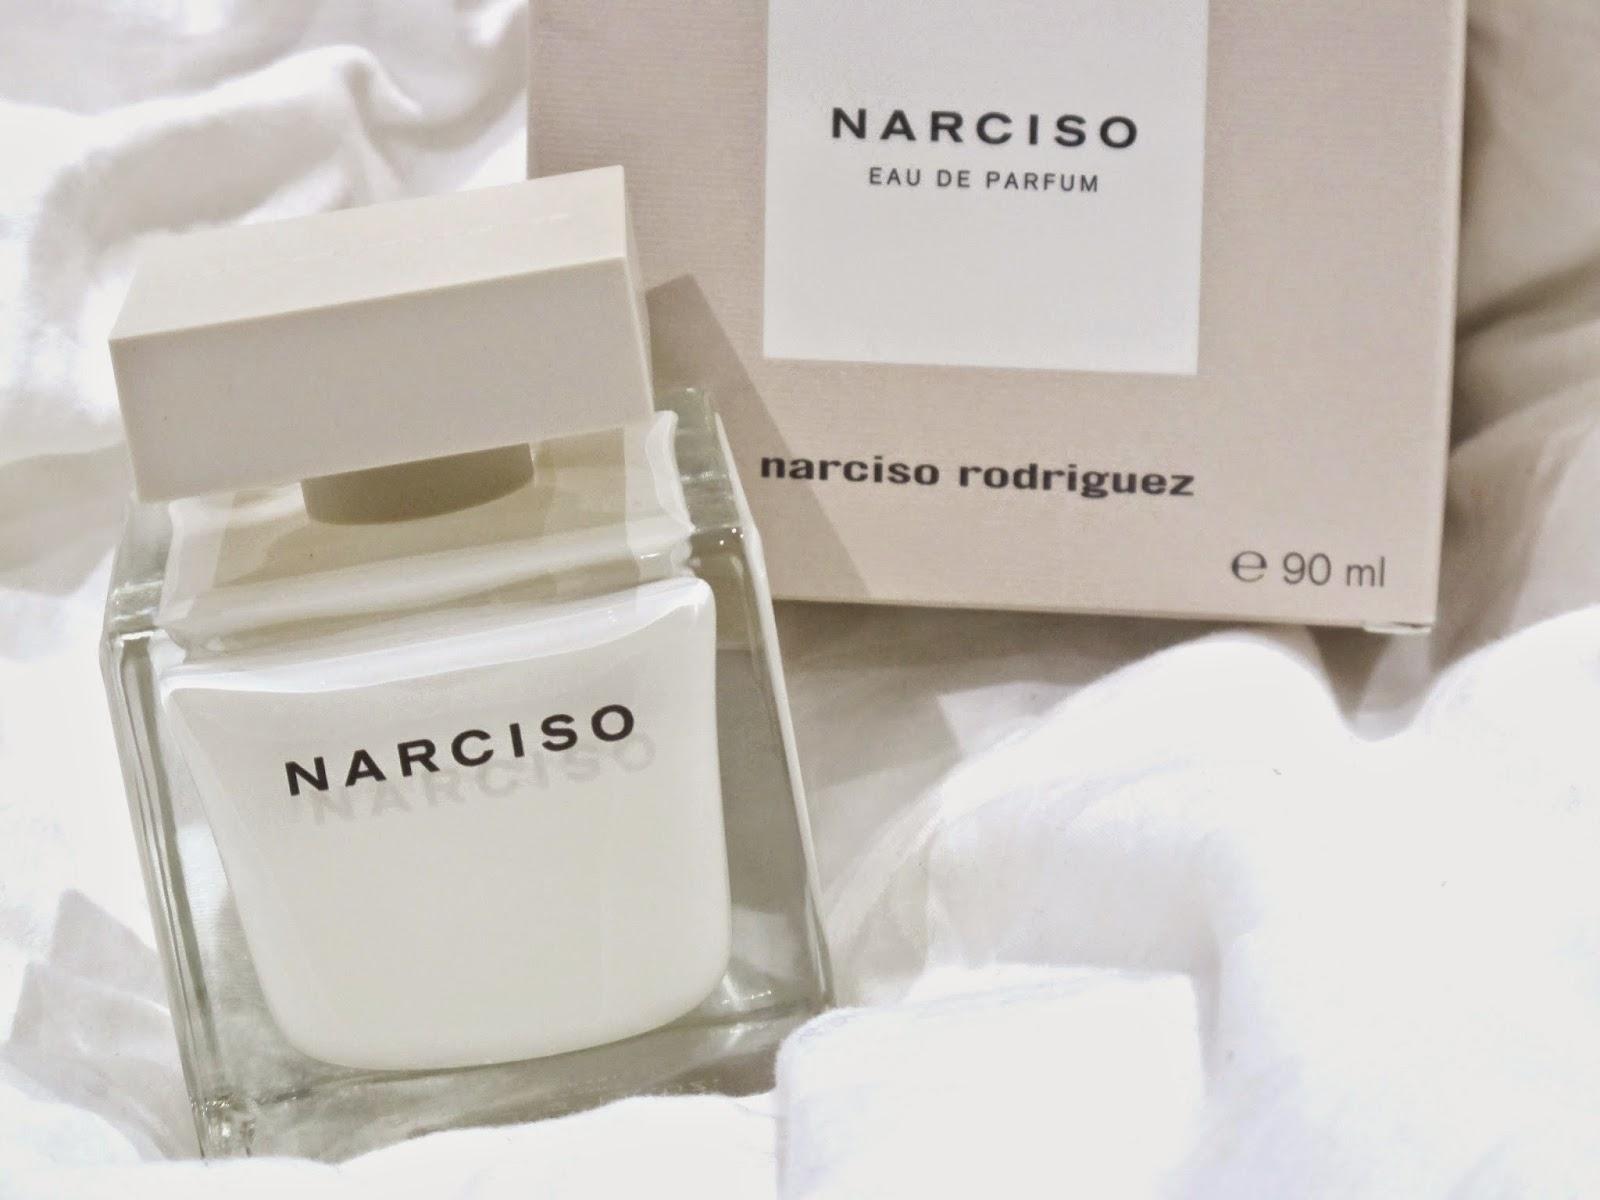 narciso eau de parfum emma louise layla. Black Bedroom Furniture Sets. Home Design Ideas